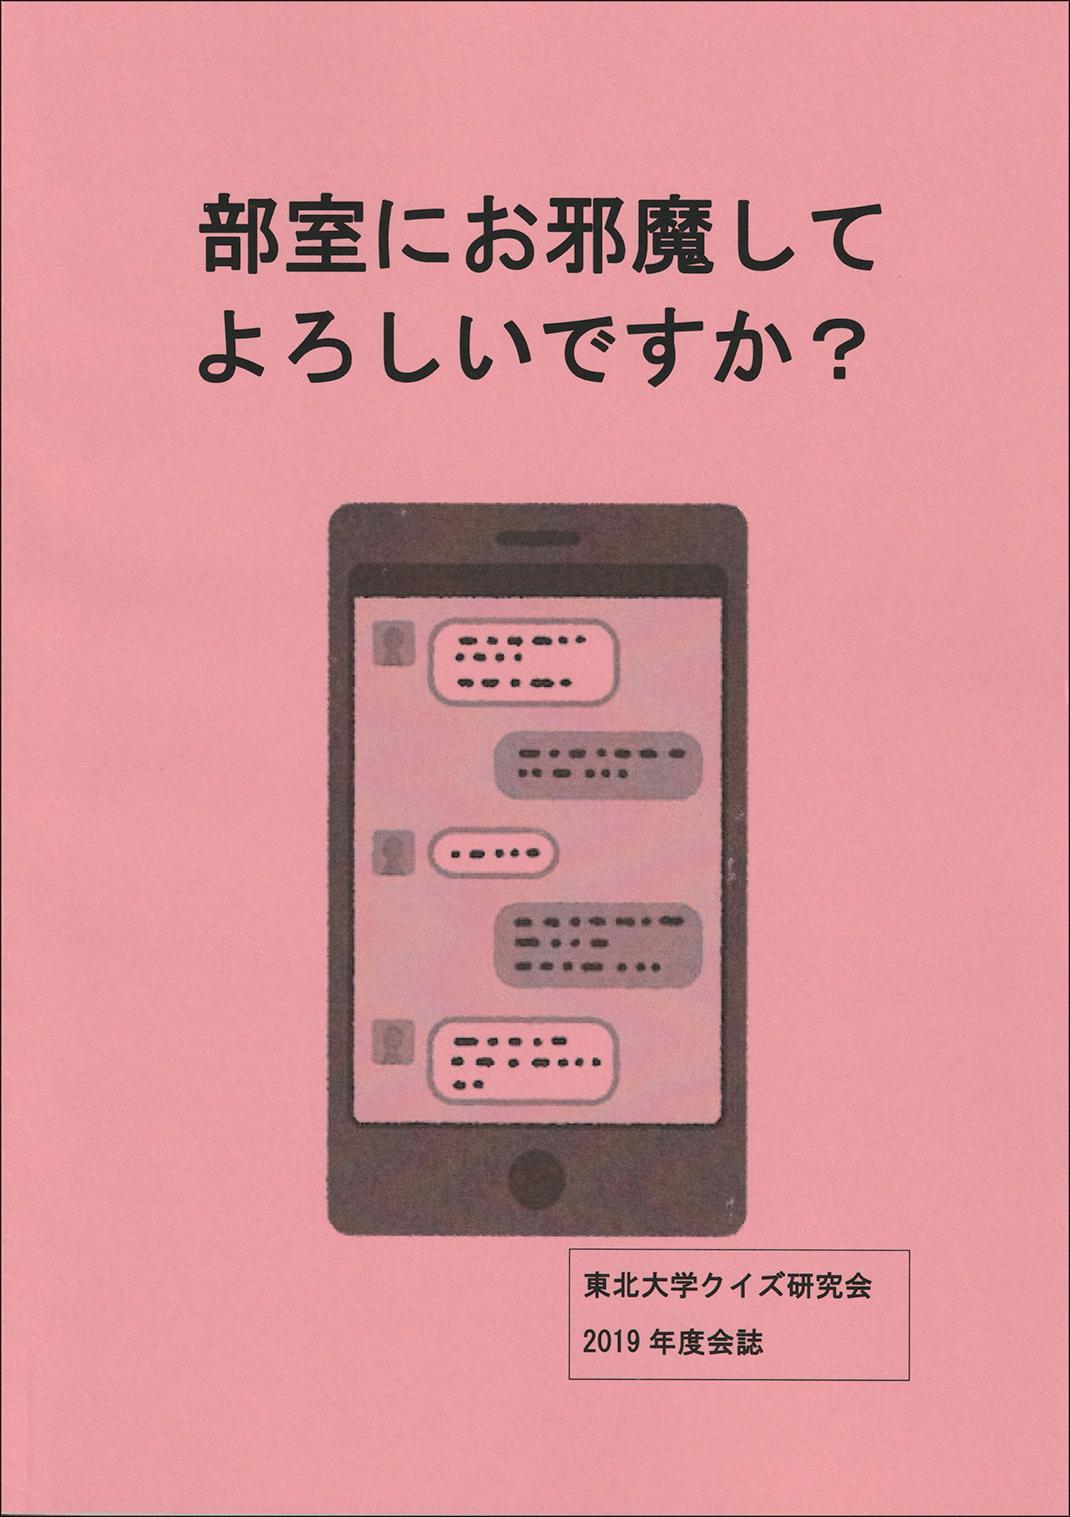 C12841798